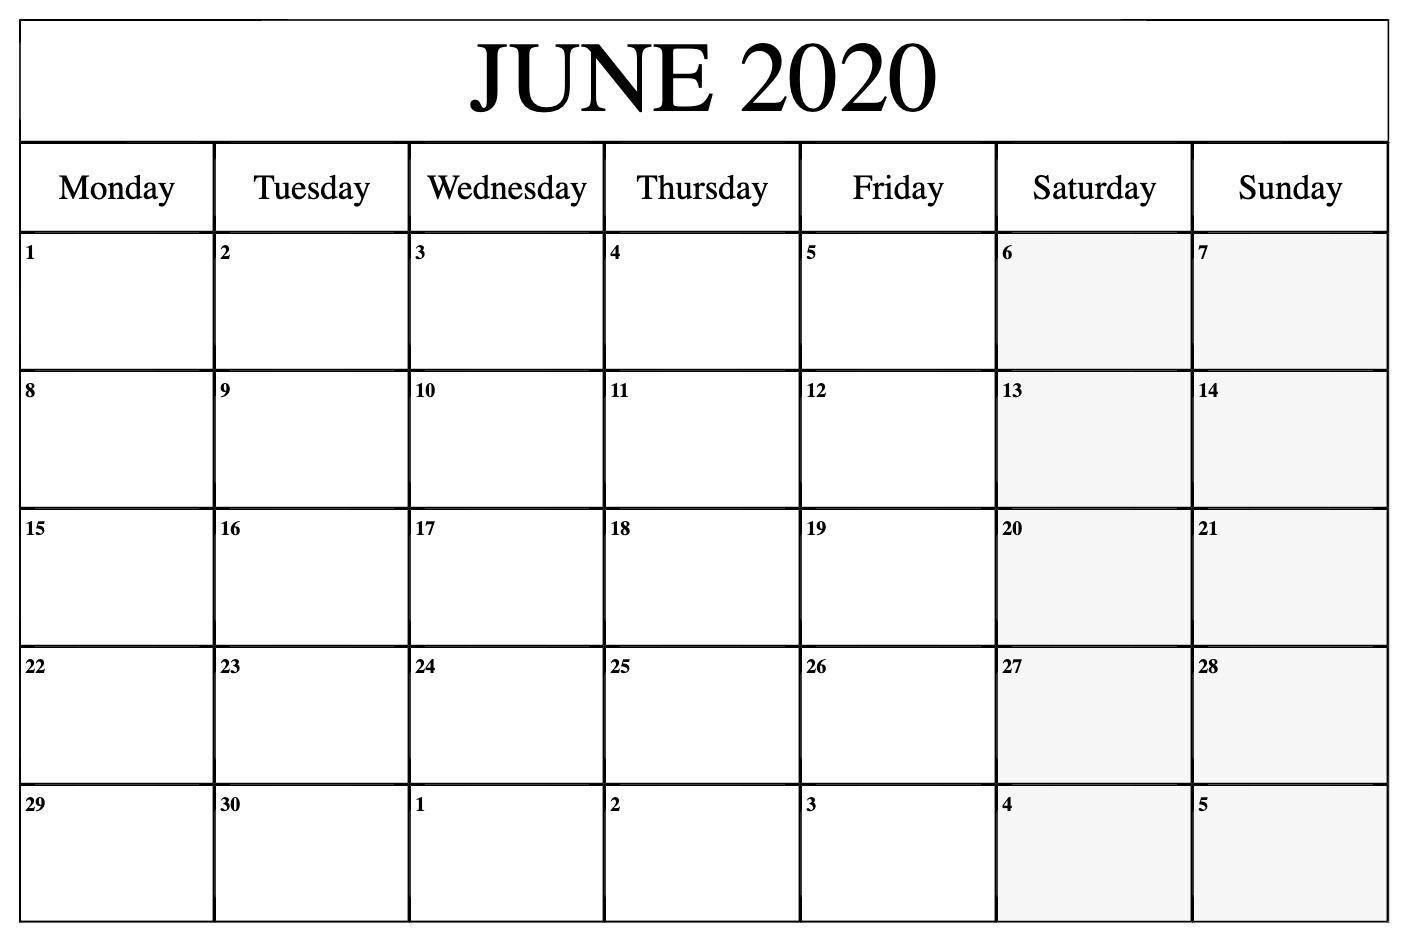 Free Editable June 2020 Calendar To Print Pdf Word Blank-July 2020 Large Claendar Template